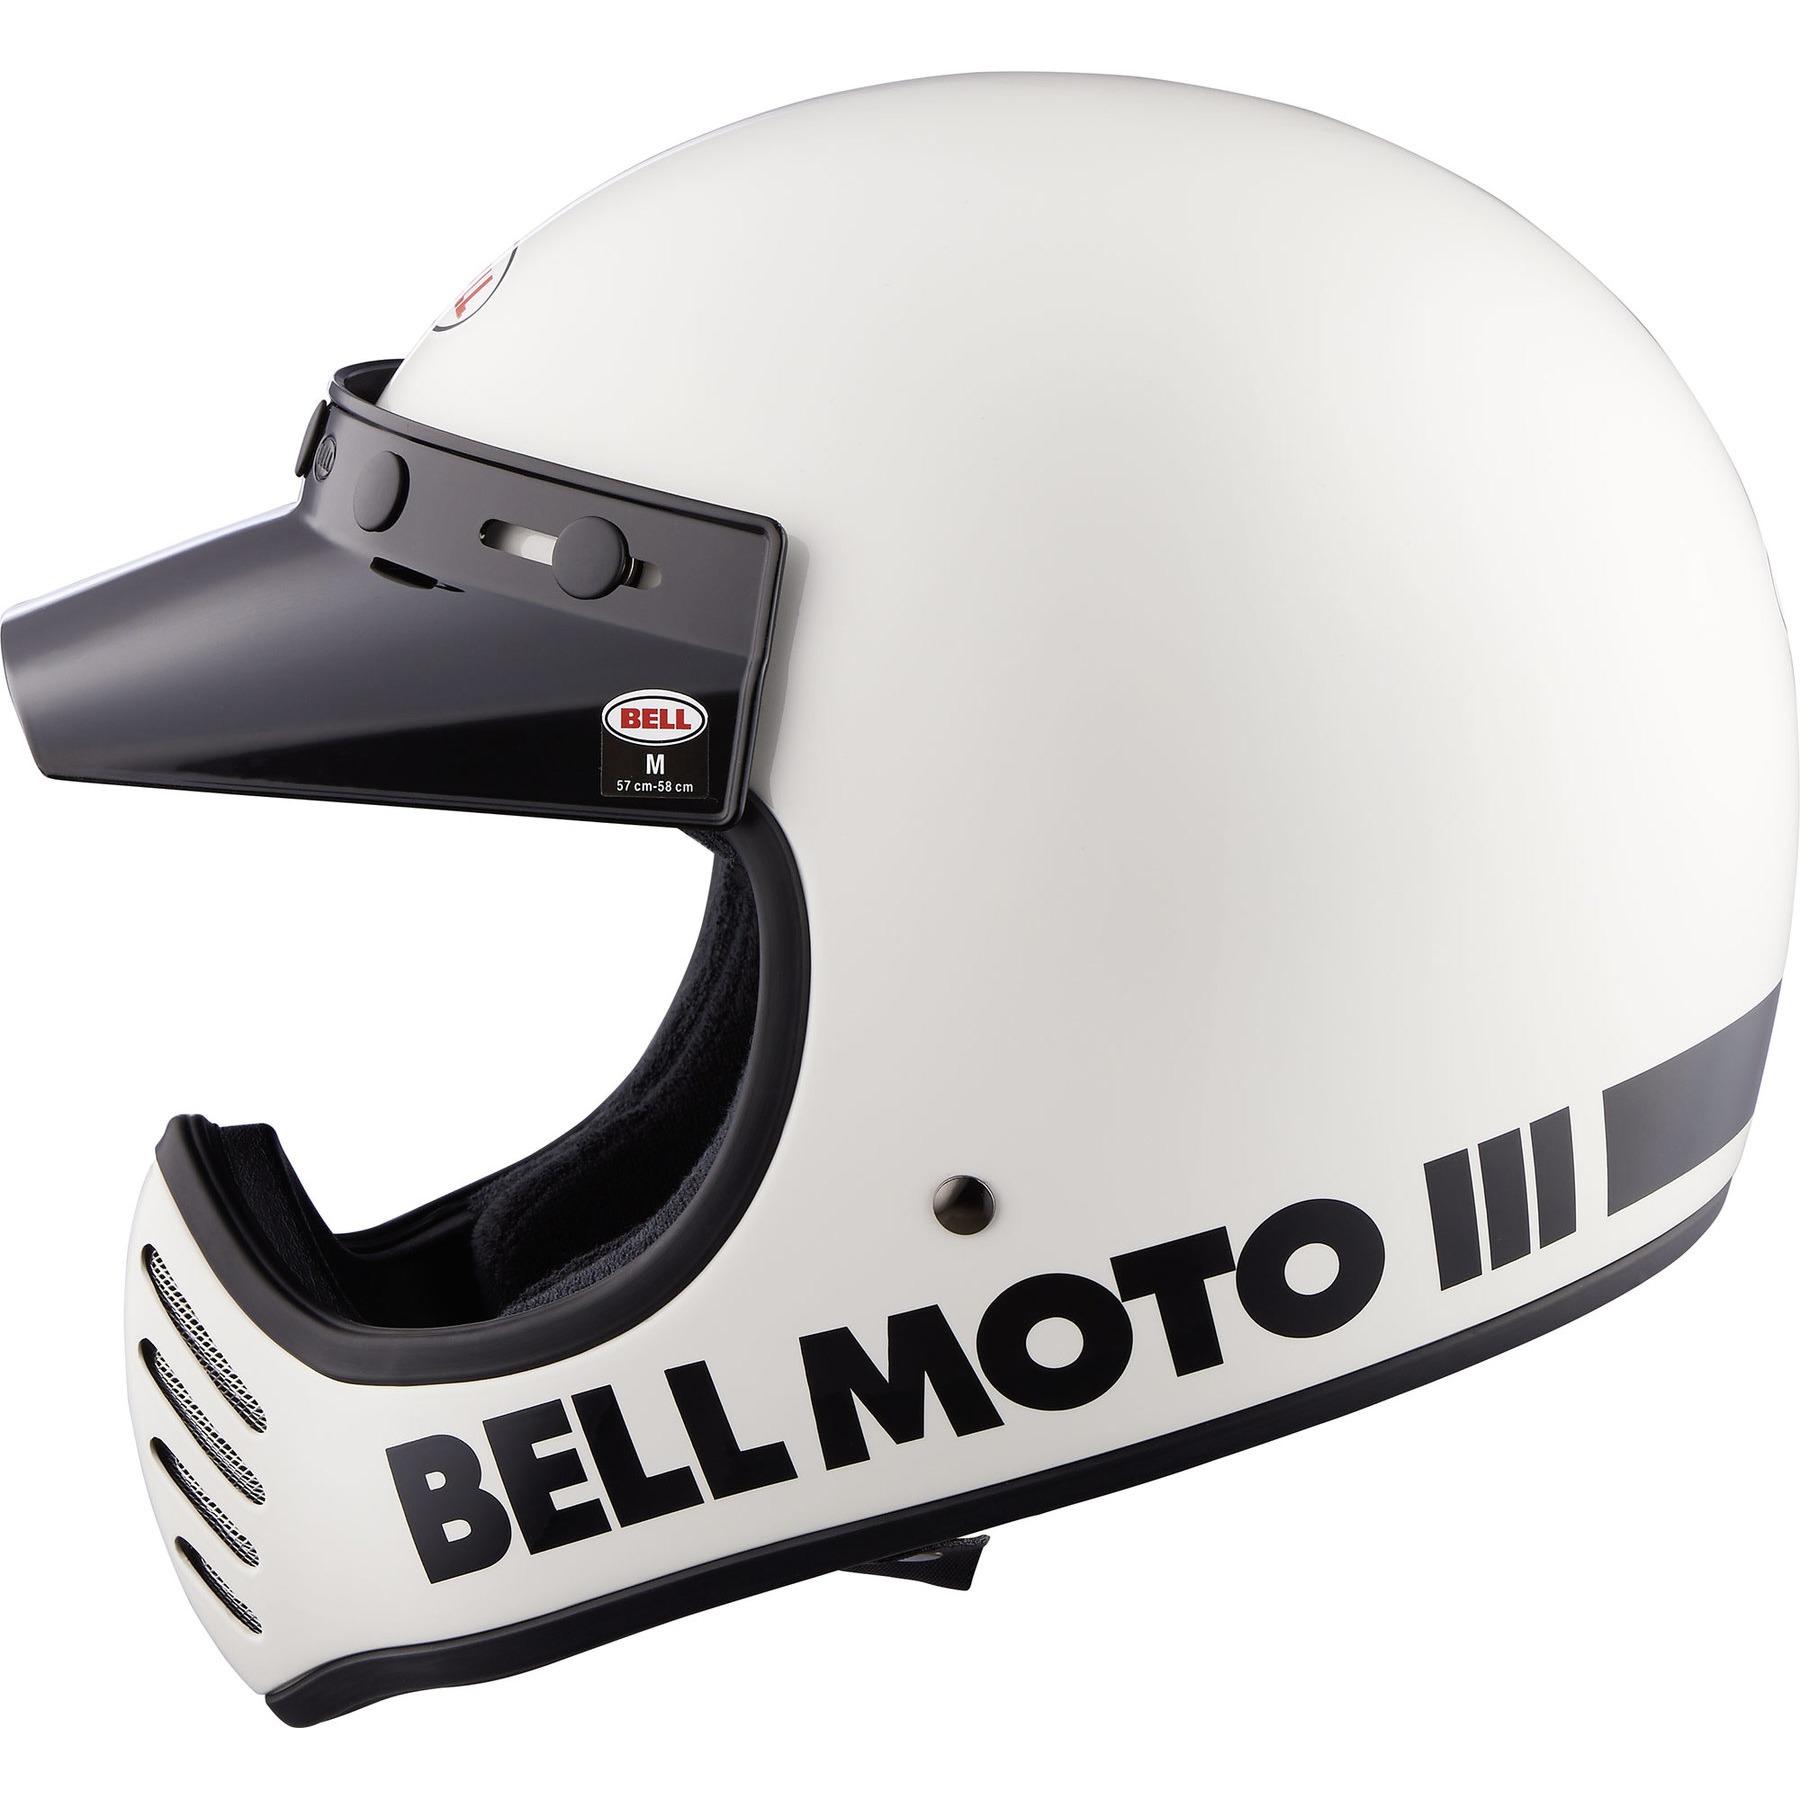 4 Kit stripes stickers standard retro REFLECTIVE motorcycle helmet WHITE